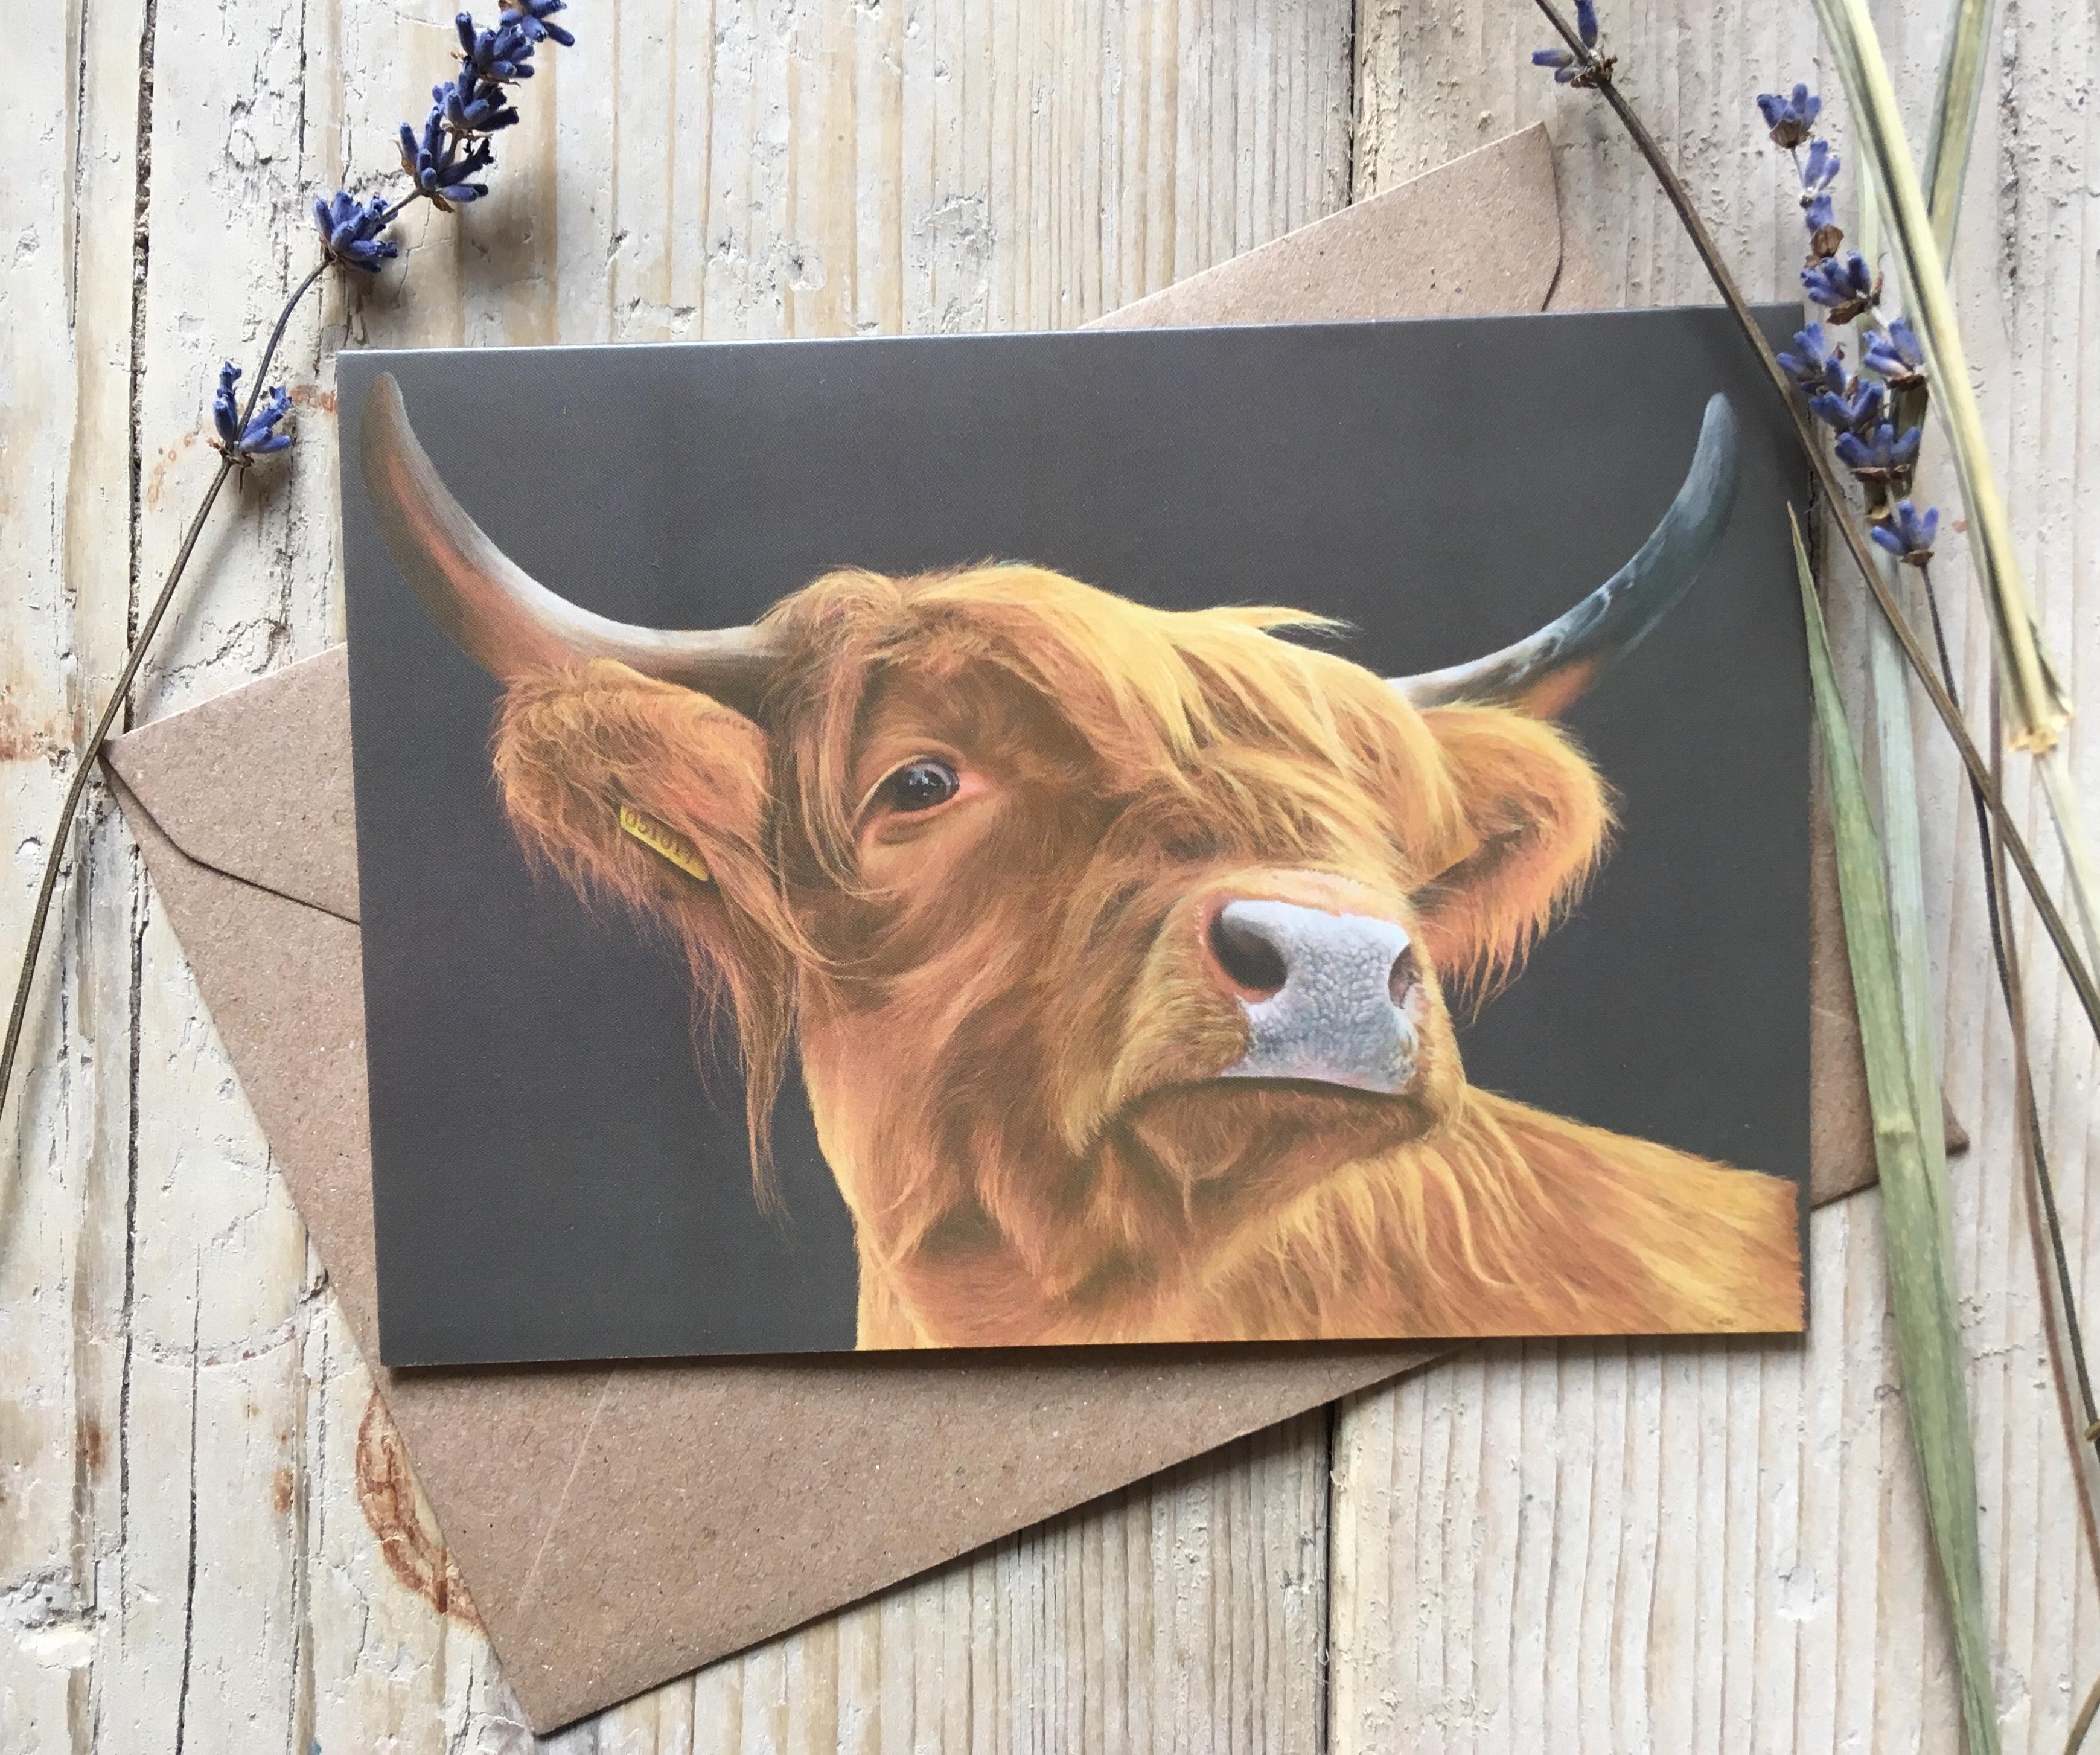 Highland Cow 'Always Watching'